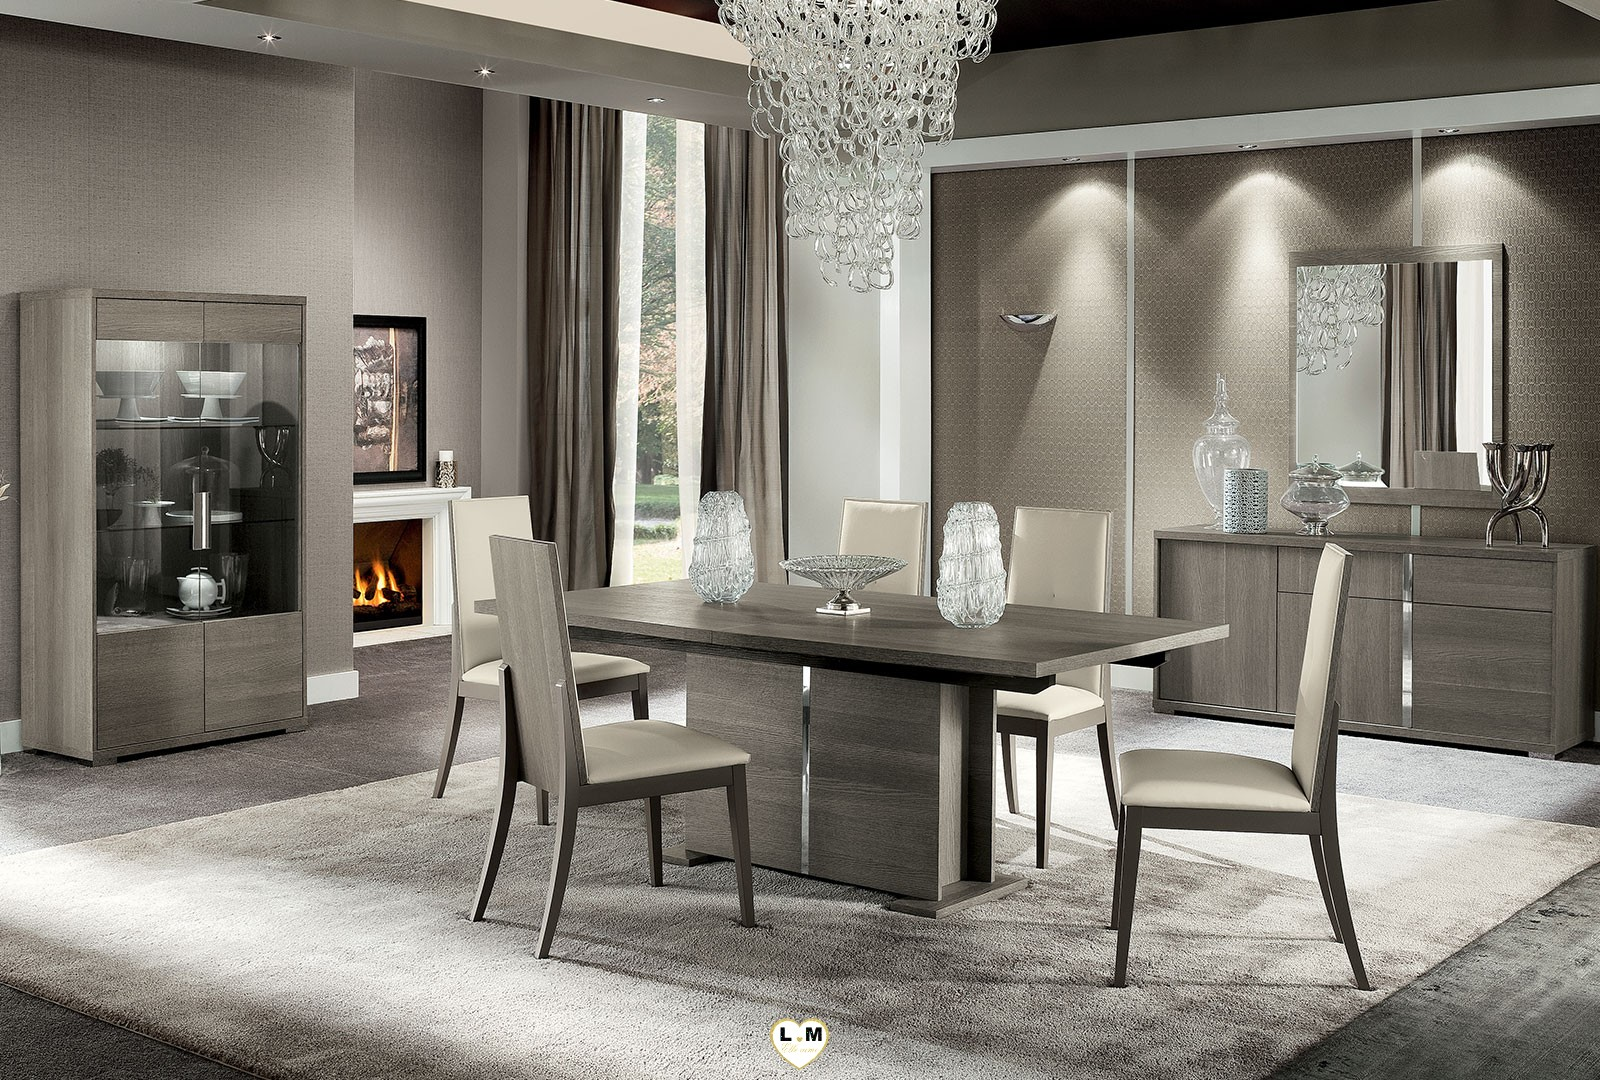 riverside chene gris mat composition murale meuble tv. Black Bedroom Furniture Sets. Home Design Ideas